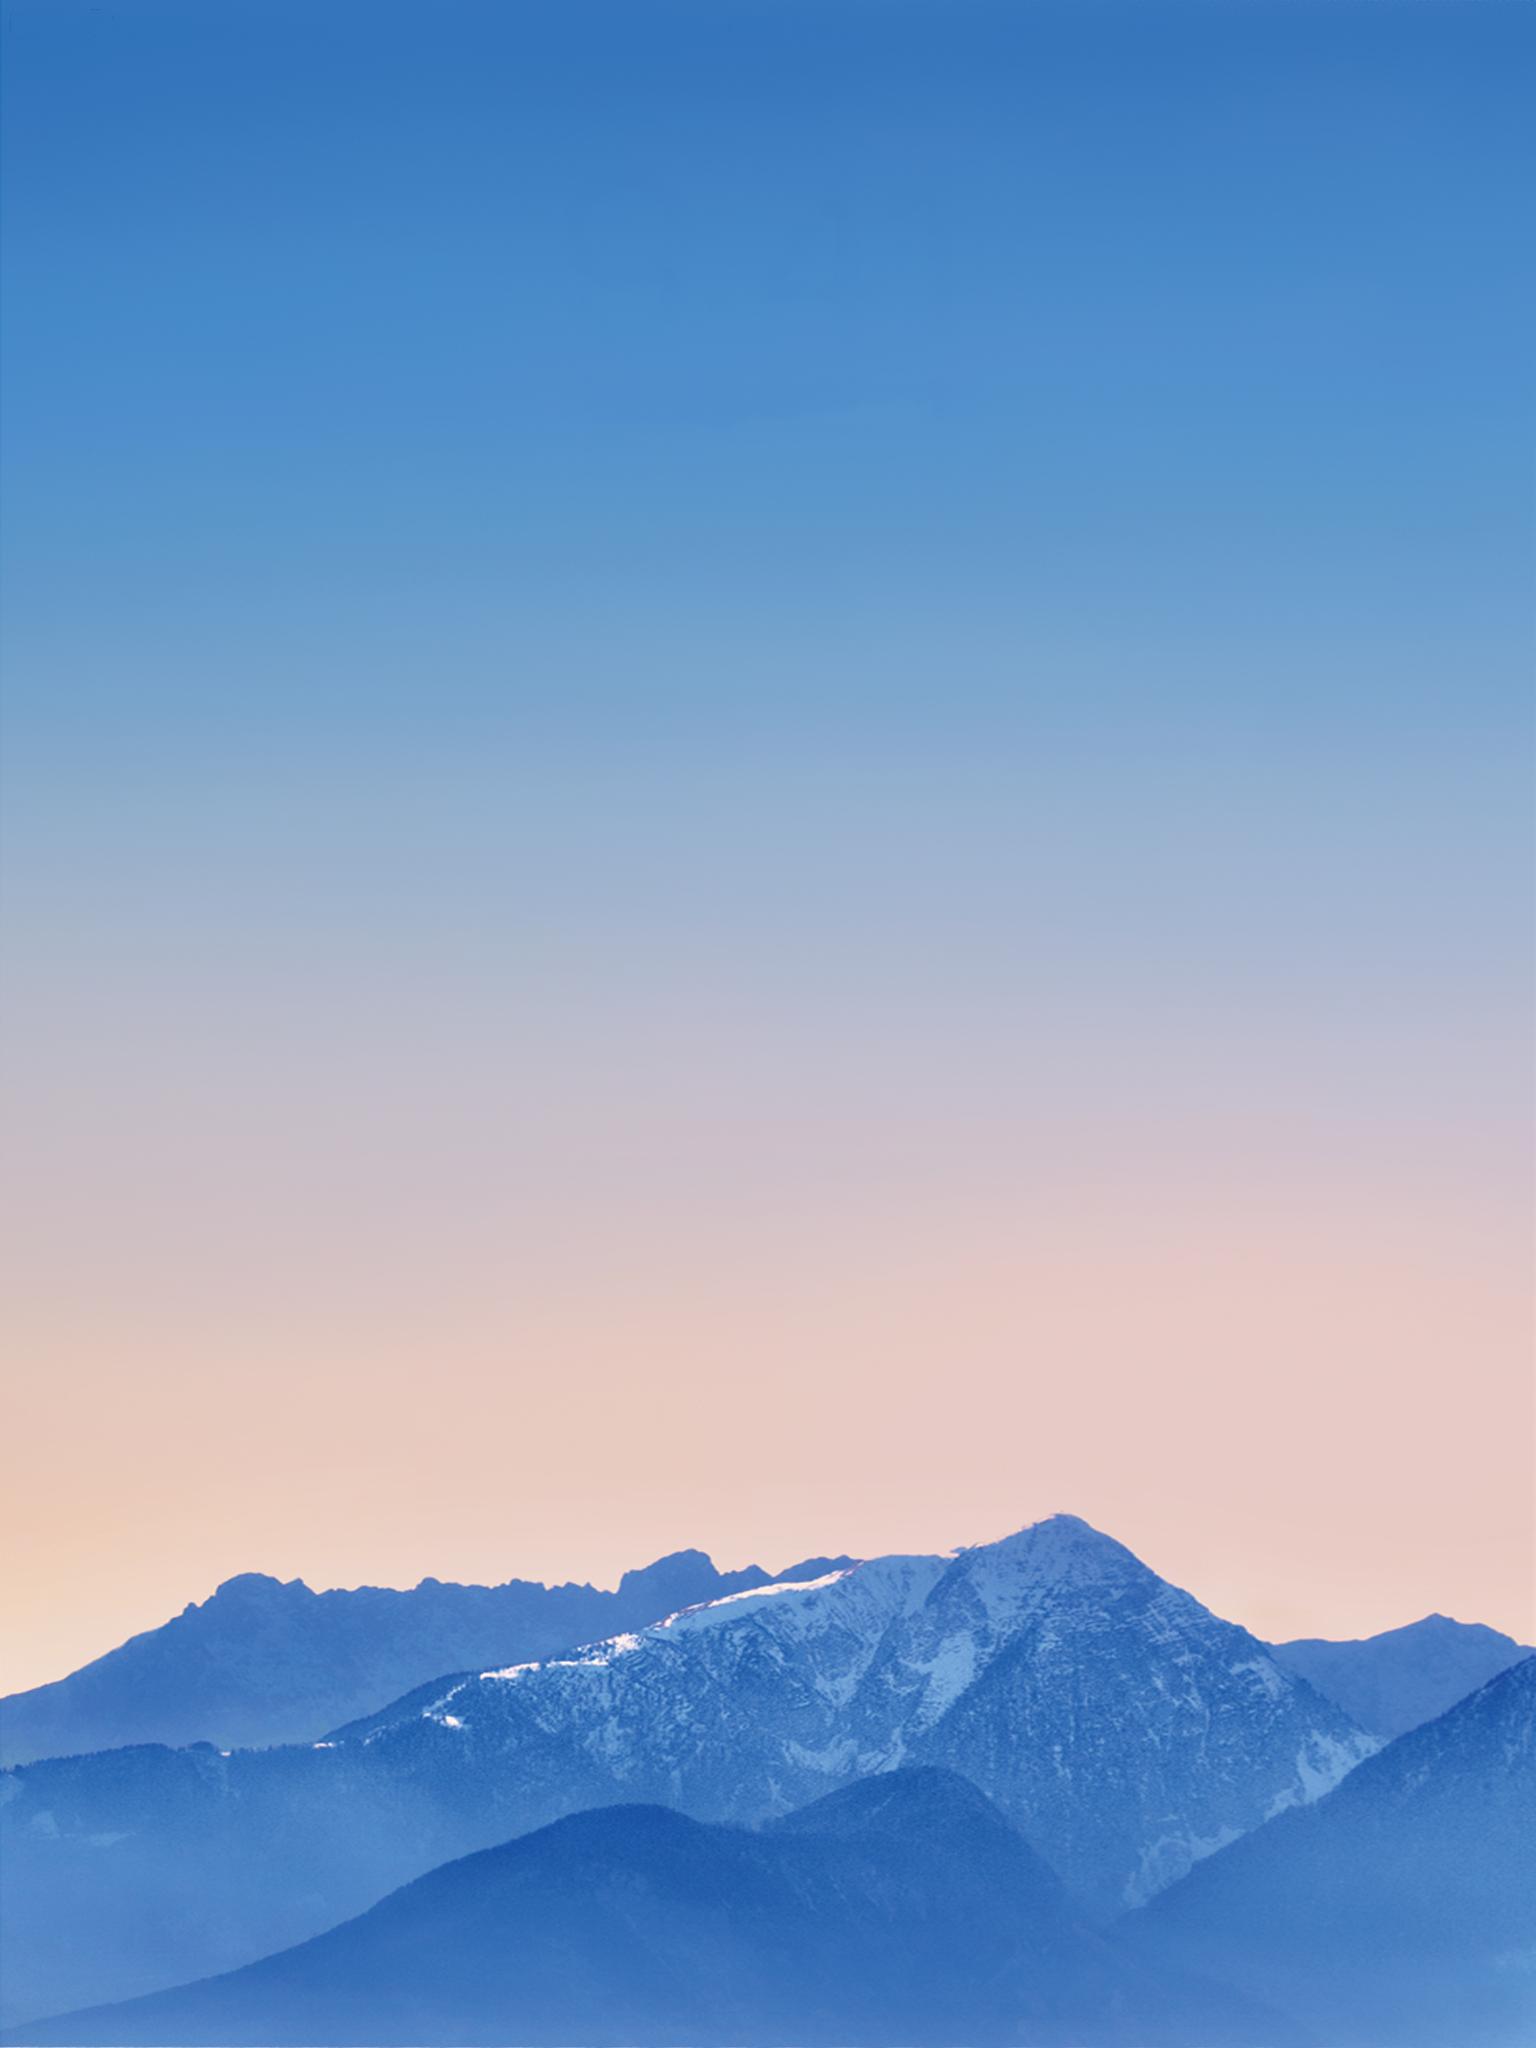 Wonderful Wallpaper High Resolution Ipad -   Best Photo Reference_738334.509266/